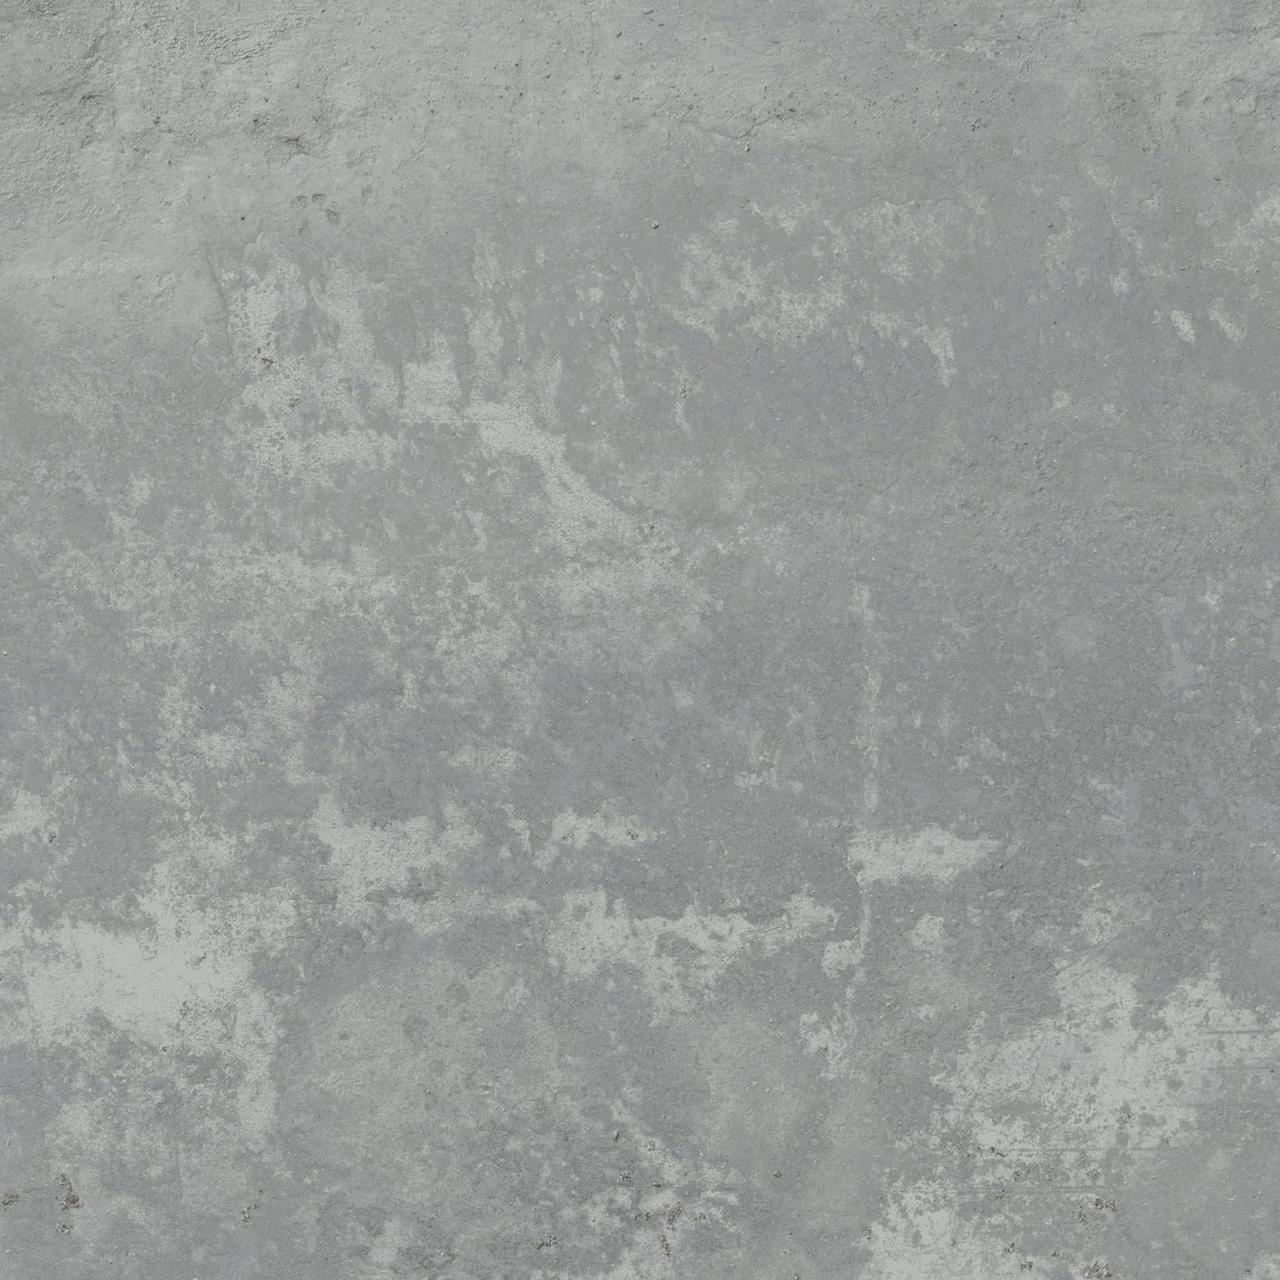 Керамограніт ALMERA CERAMICA / HALDEN STEEL LAPATO 600x600